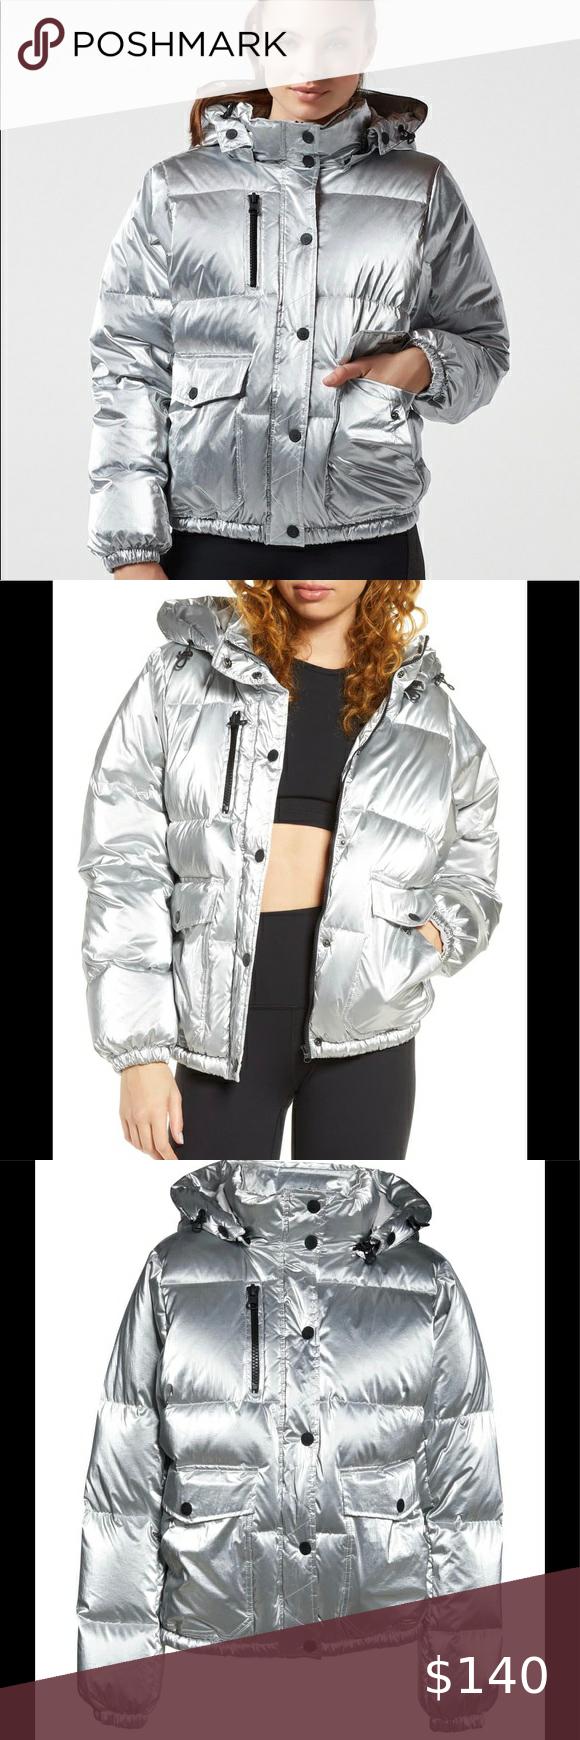 Blanc Noir Mont Blanc Down Puffer Jacket Silver Xs Clothes Design Fashion Outfits [ 1740 x 580 Pixel ]